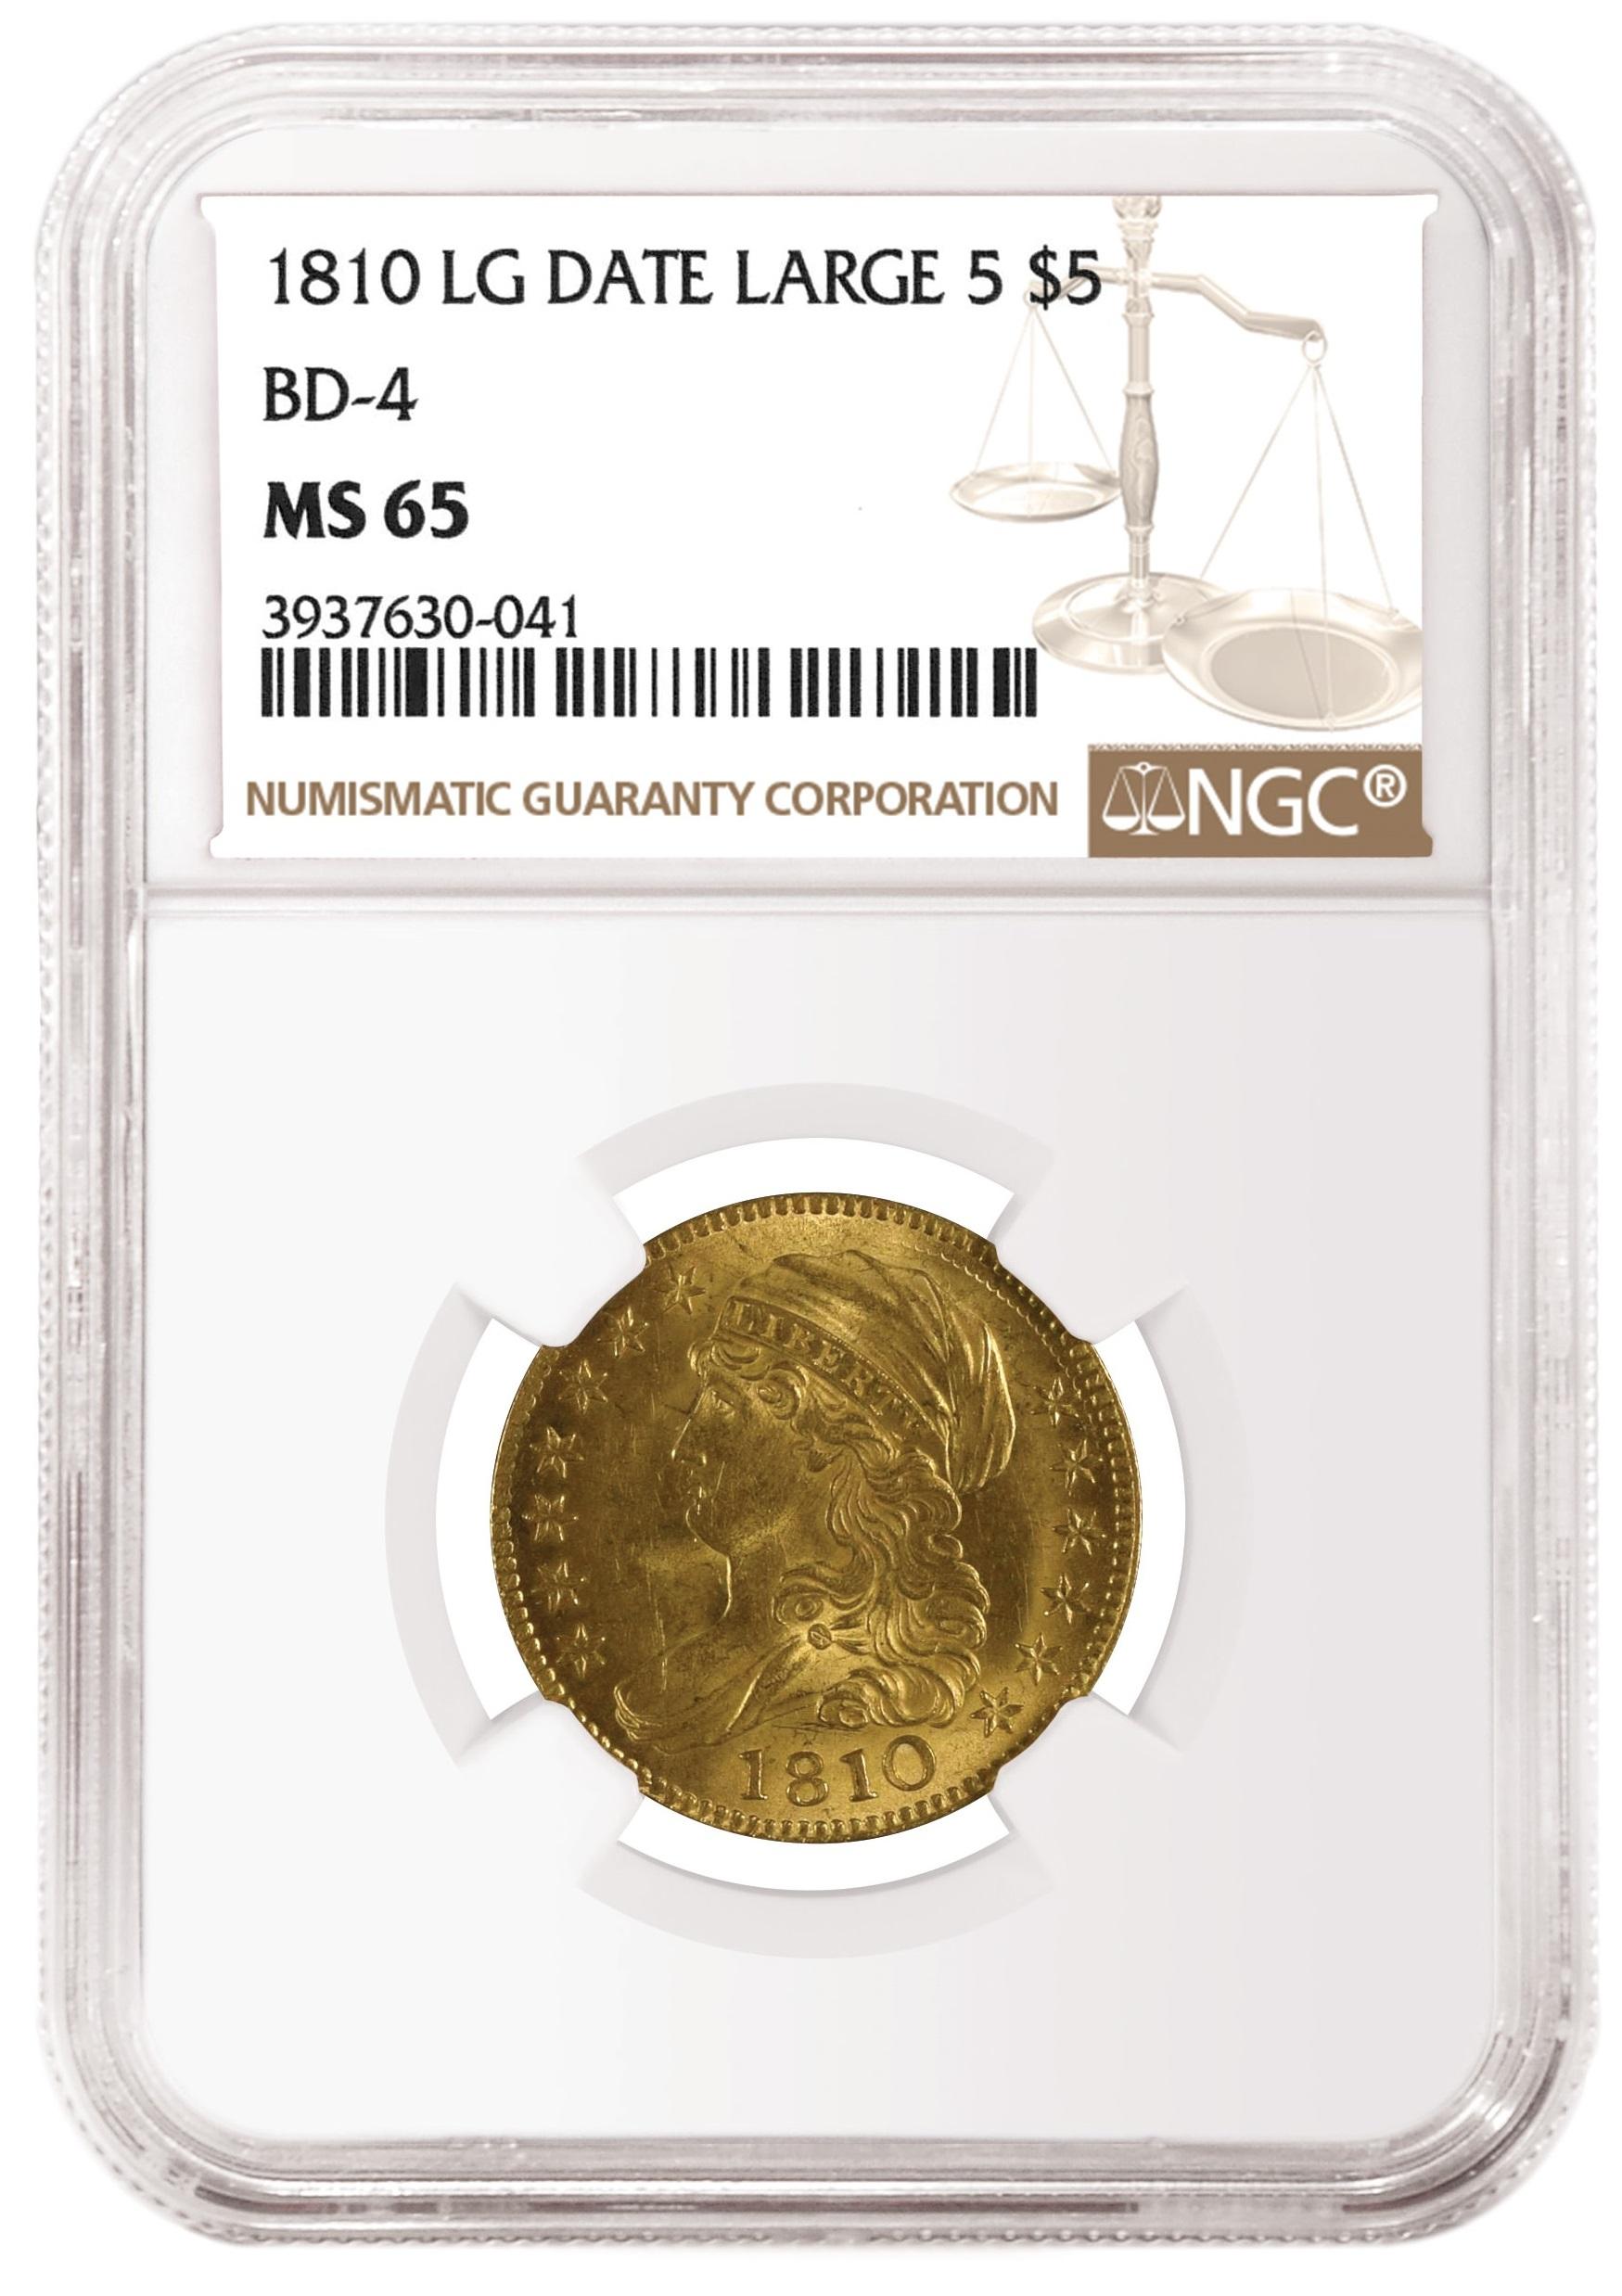 main image for NGC Grades Gold & Palladium Rarities in Germany